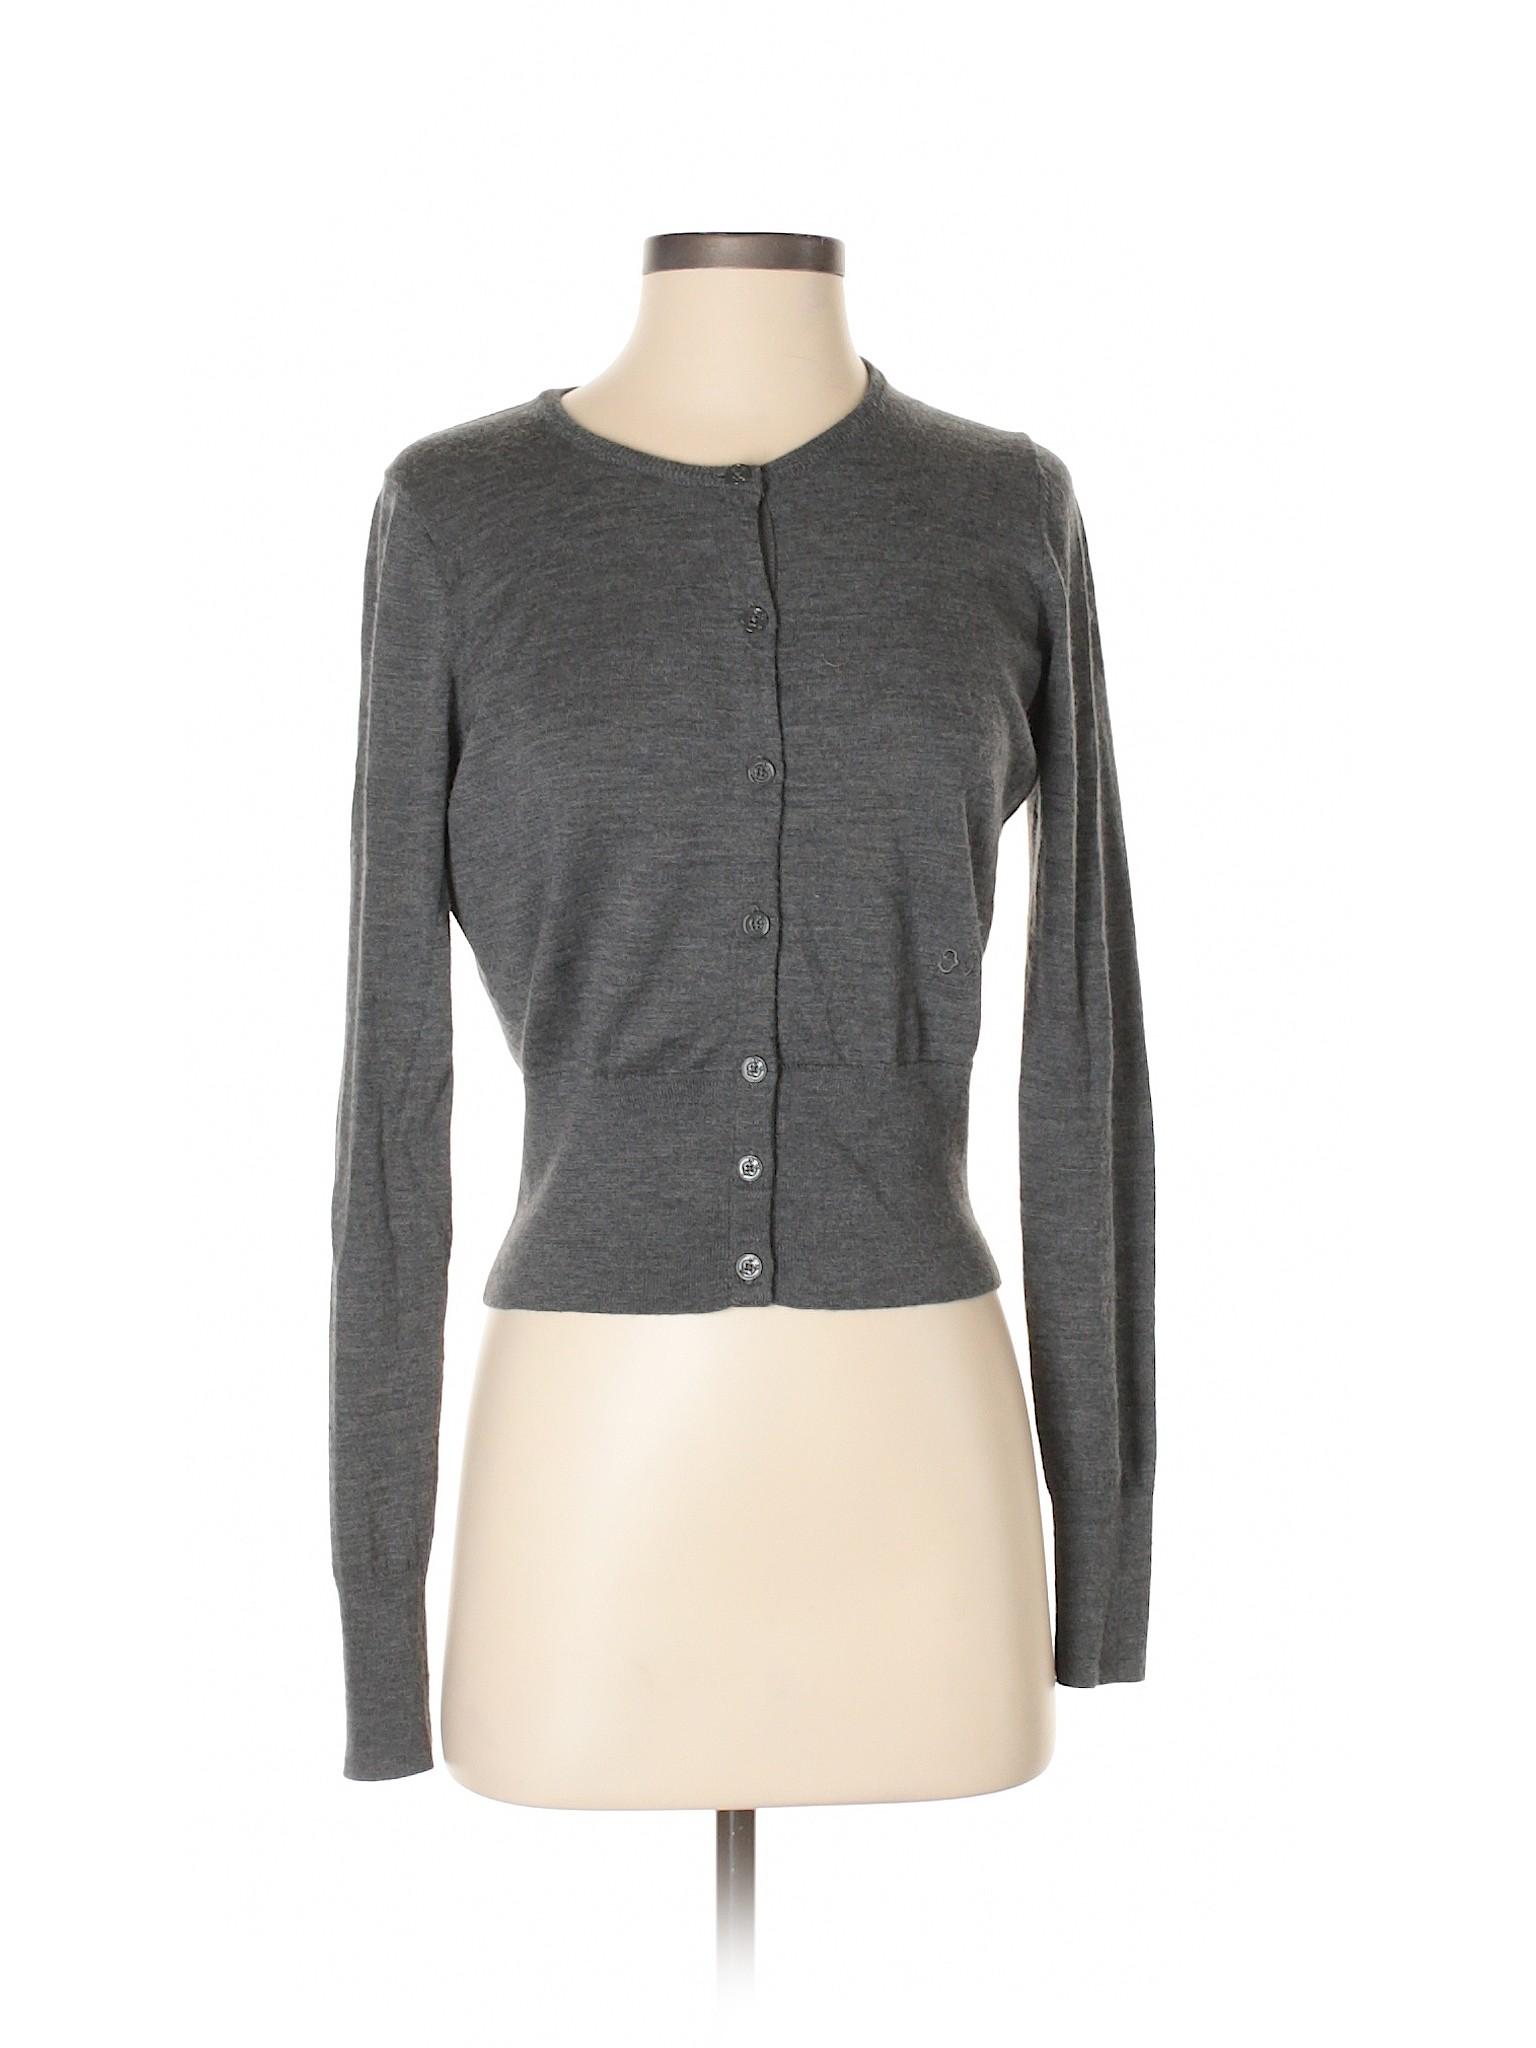 Boutique winter Wool Wonder C Cardigan qPrwnU4qv